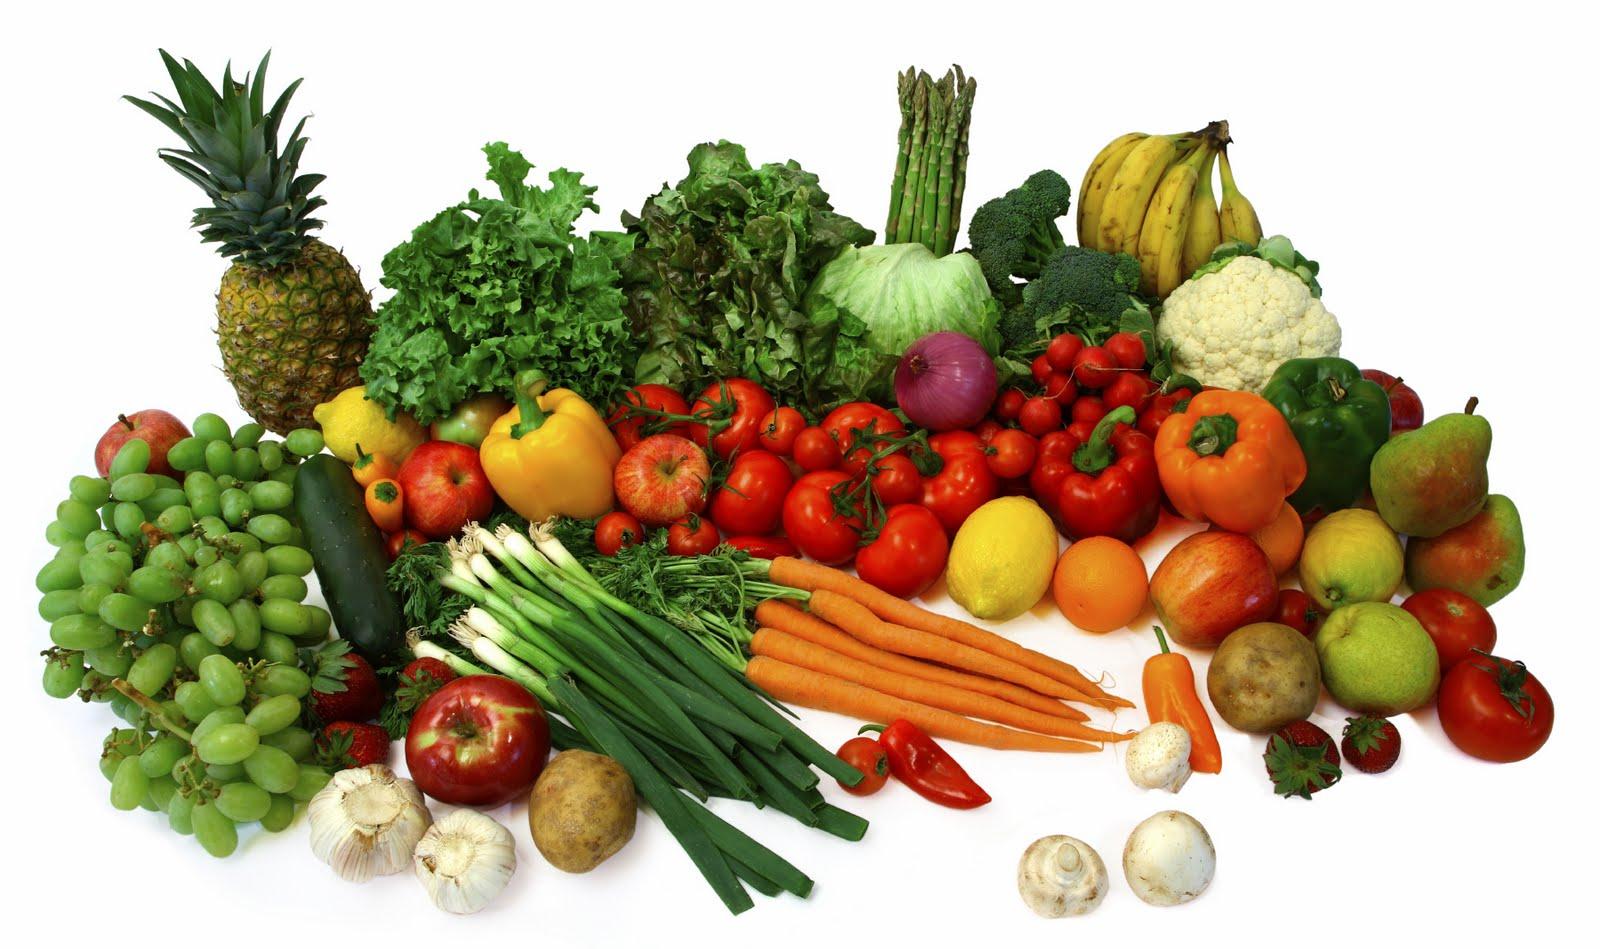 lilyisyummy: Analysis of food groups